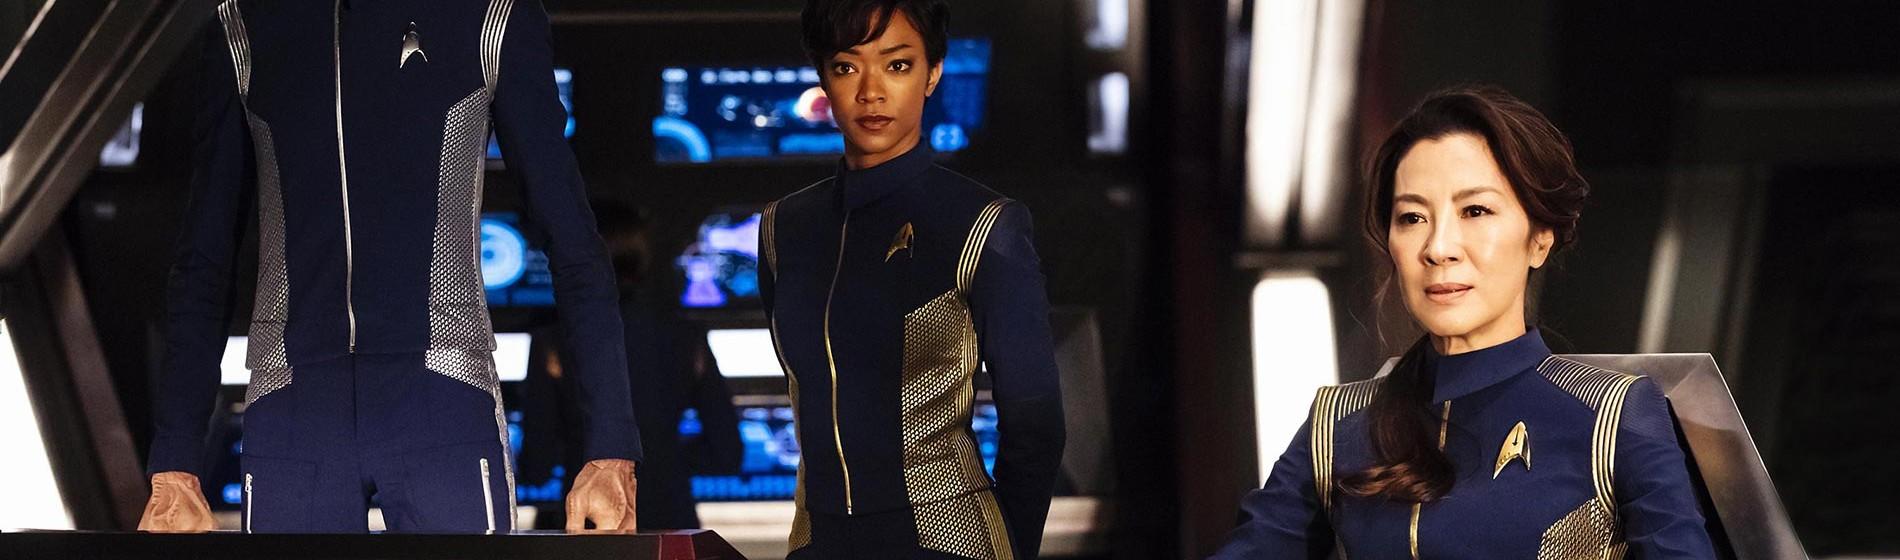 Star Trek: Discovery The Vulcan Hello